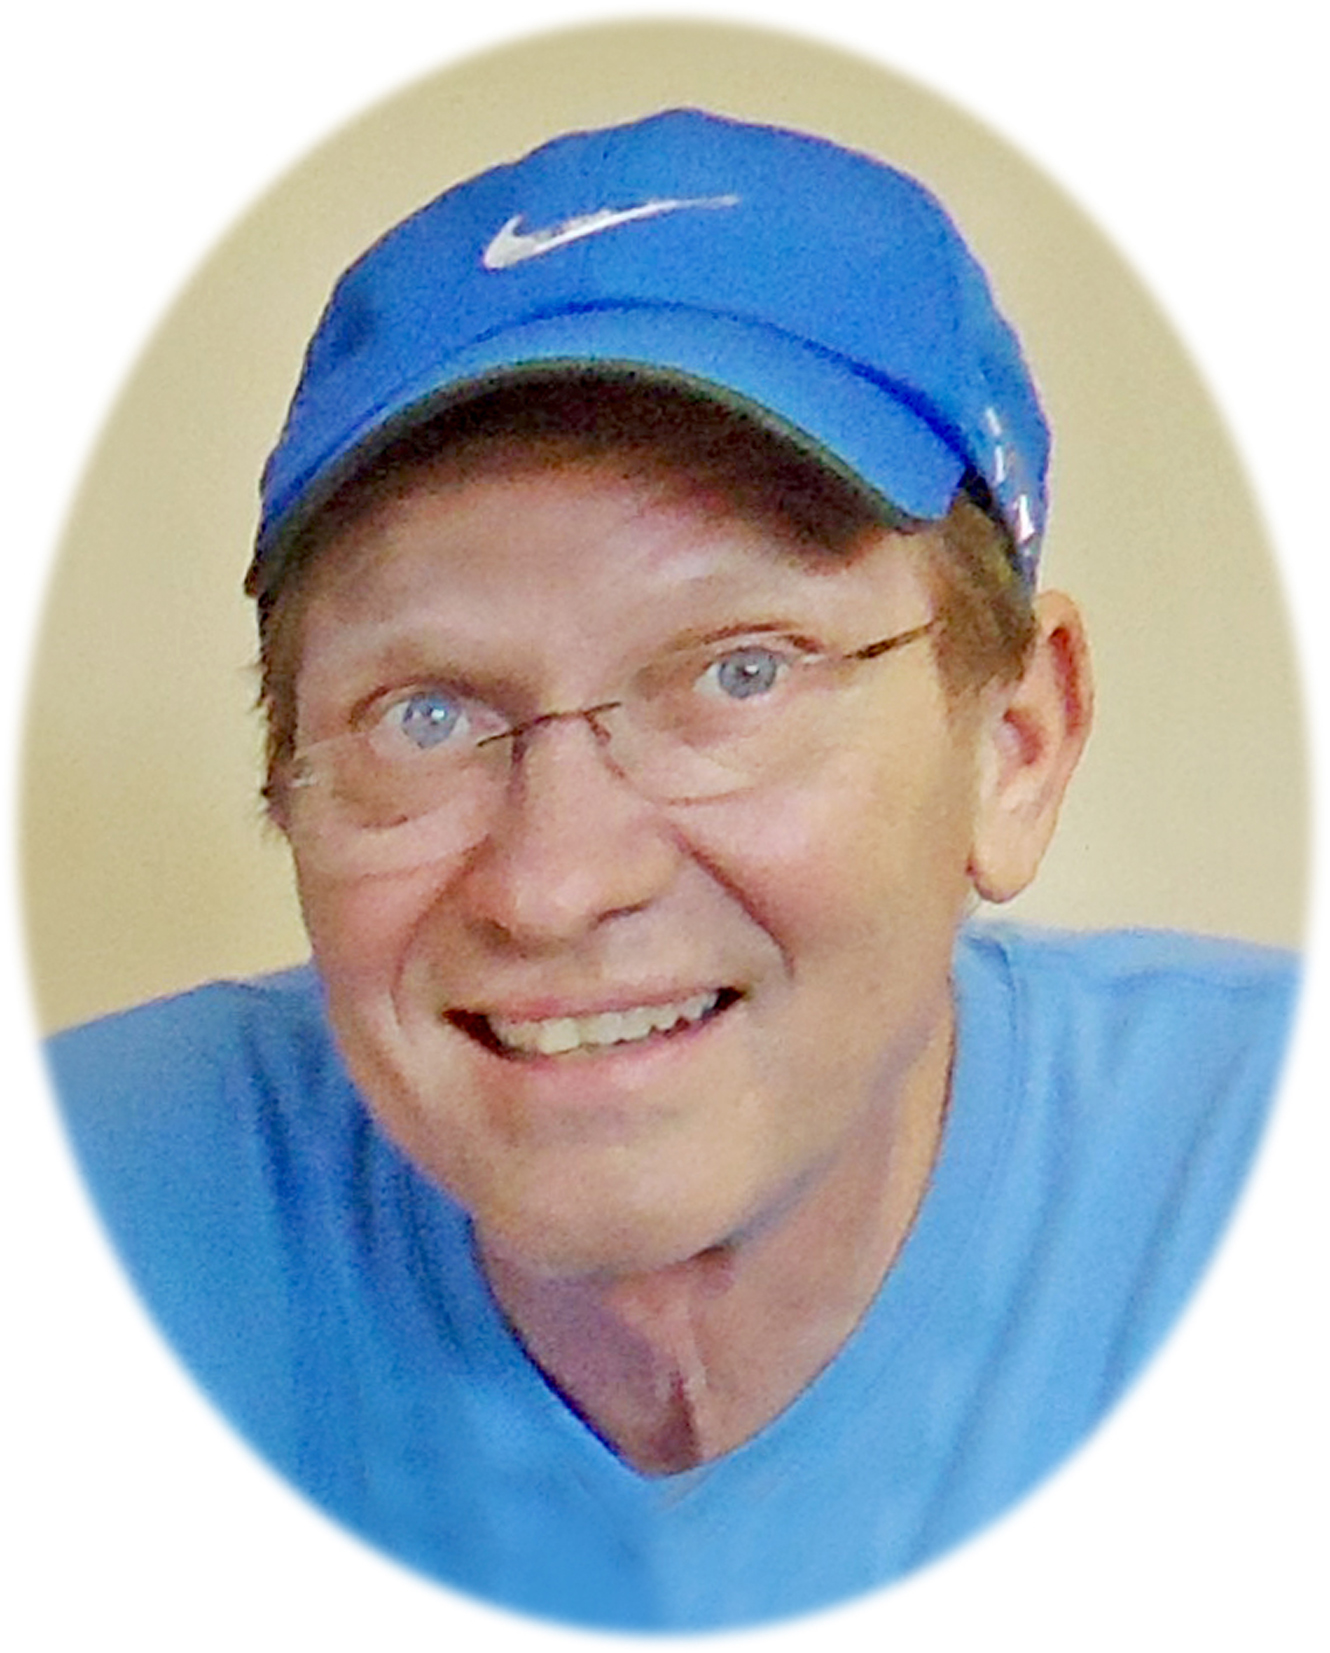 Michael J. Lohman